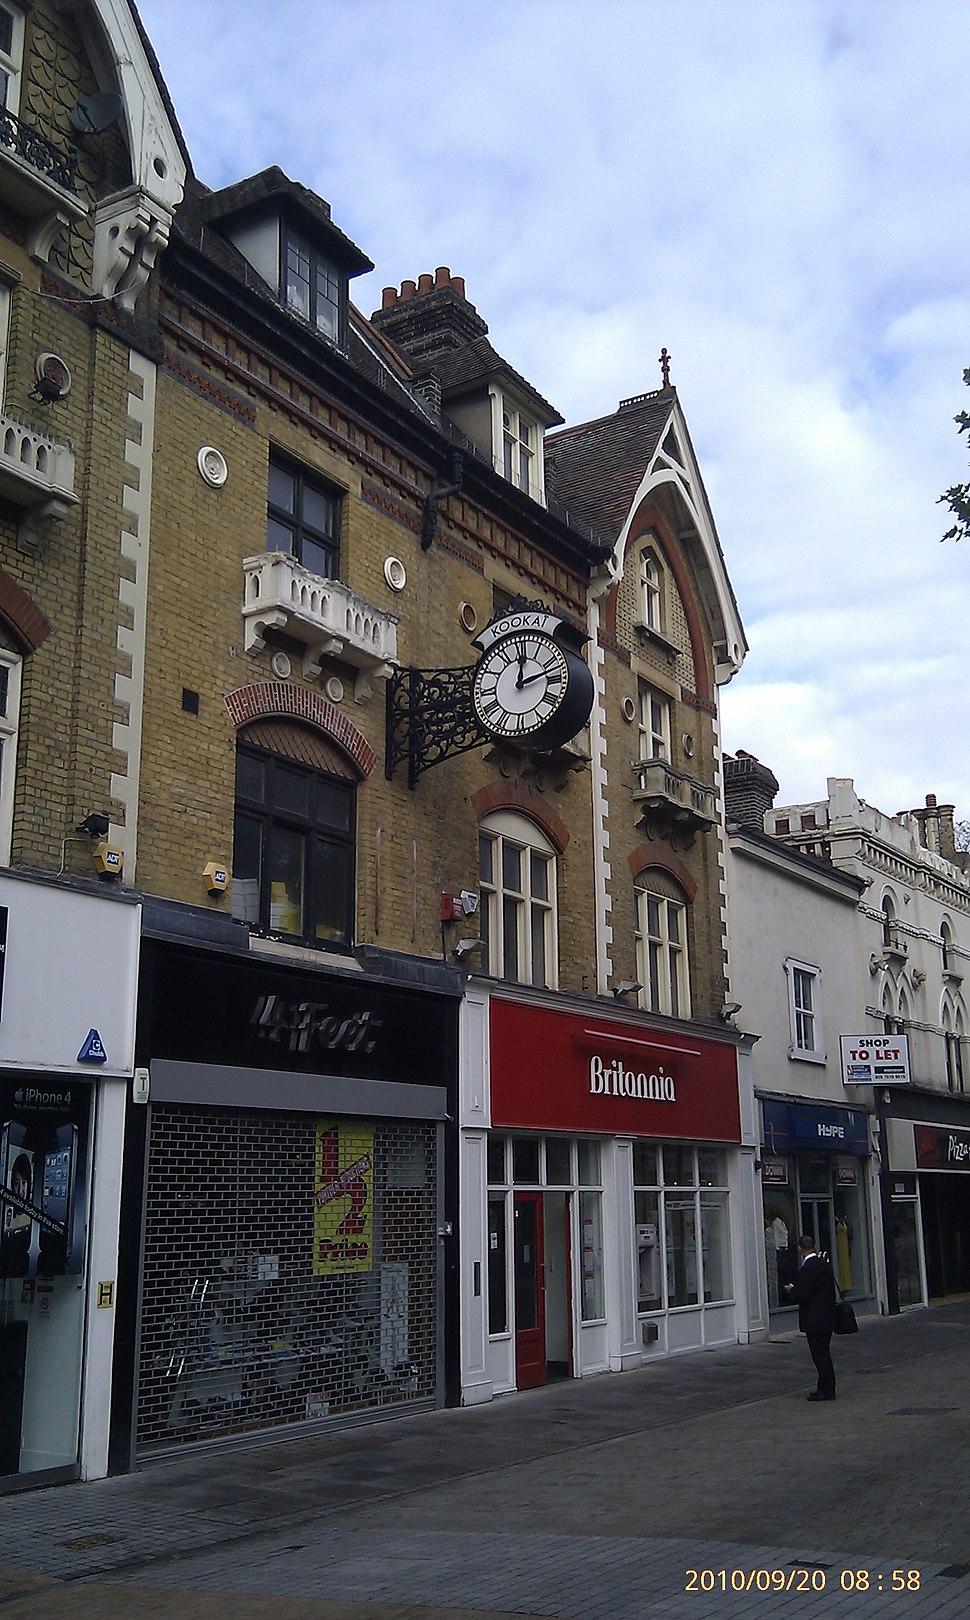 Kookai Clock Croydon